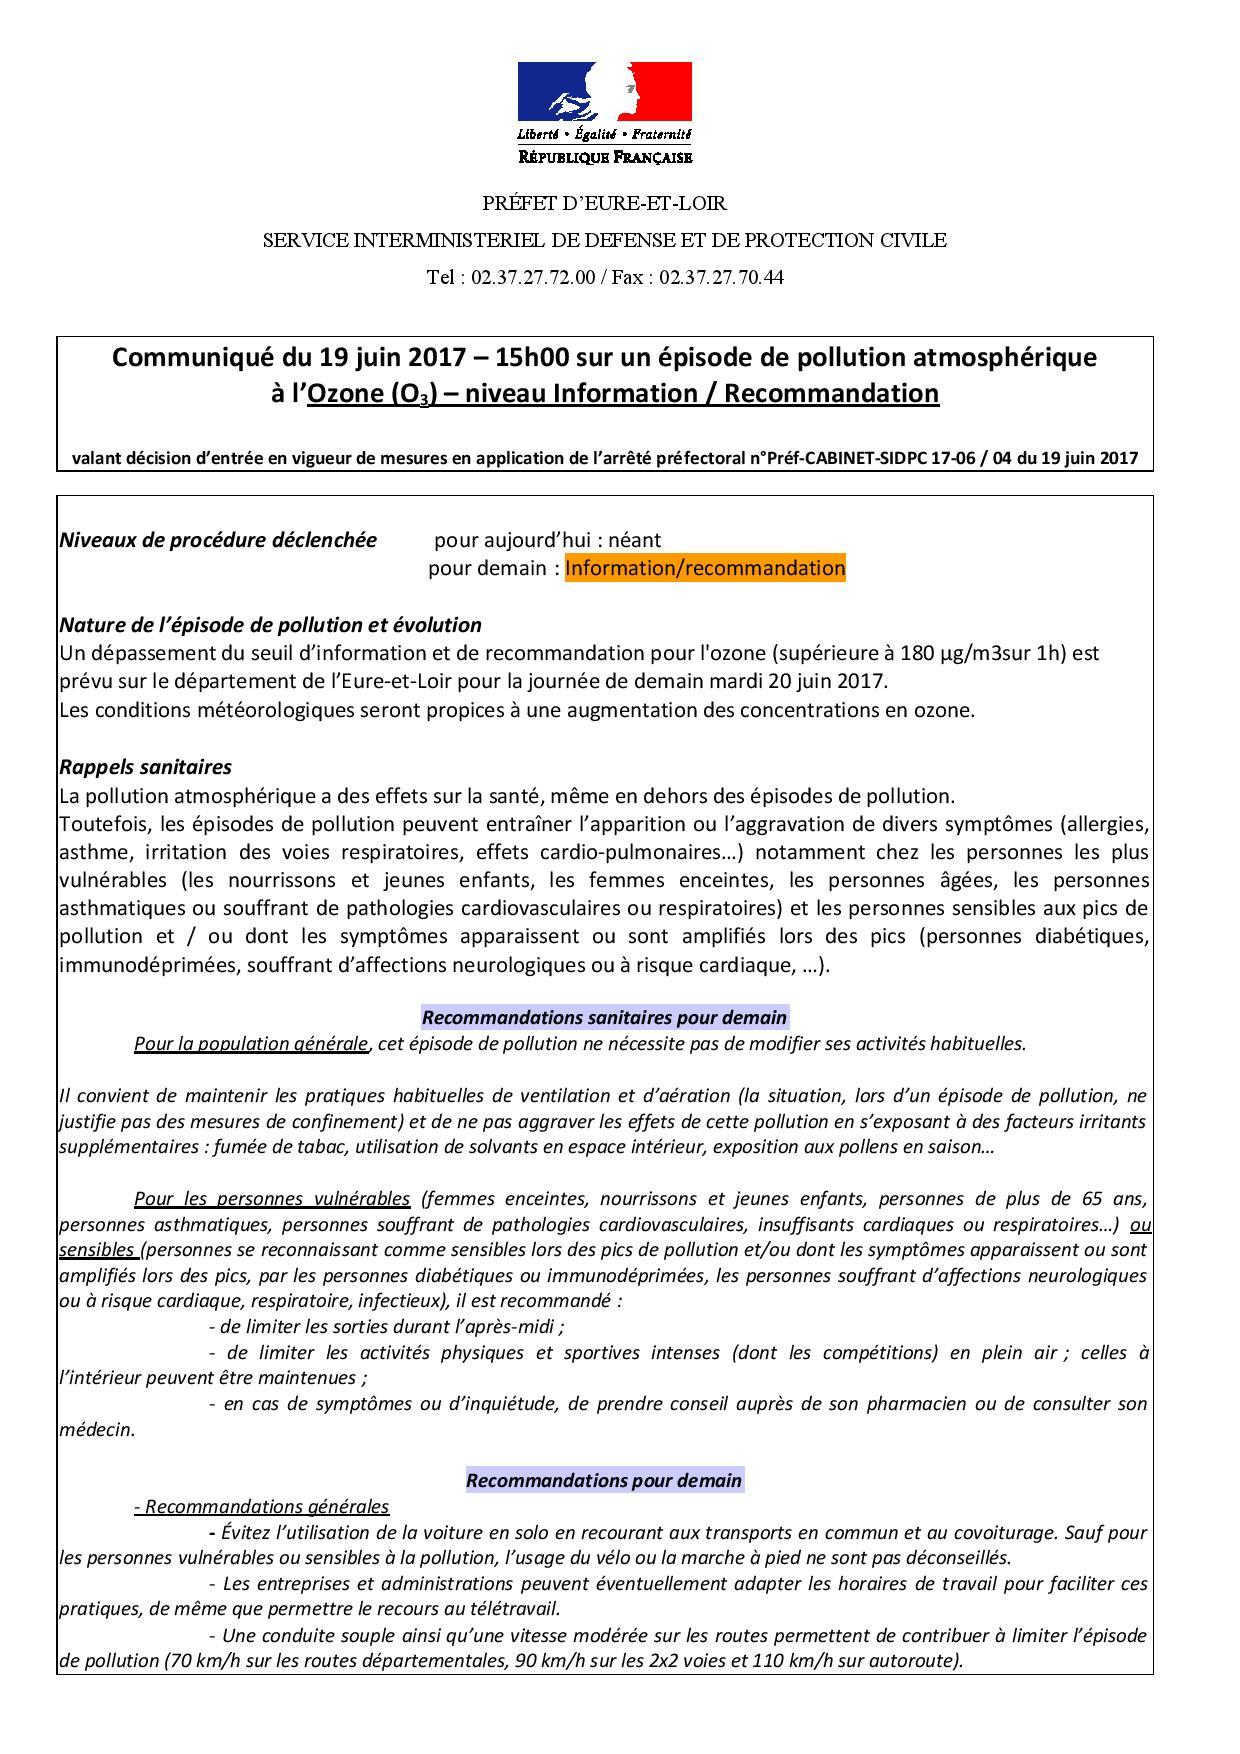 alerte-pollutin-atmosph-19-06-2017-p-1